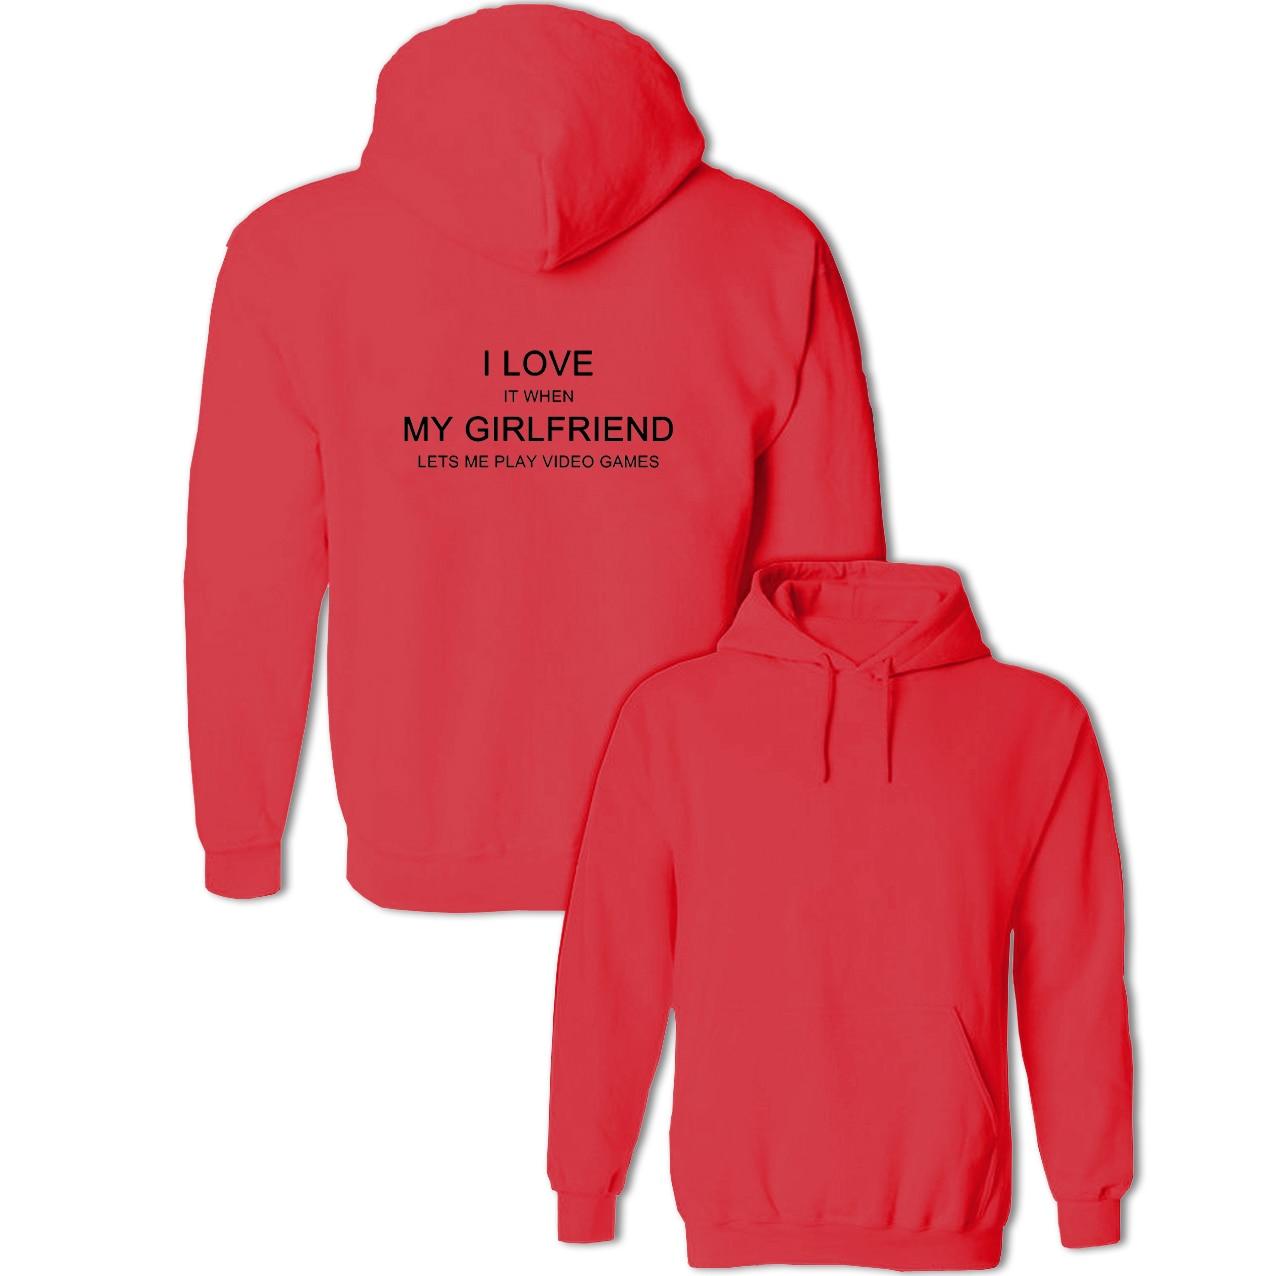 Eu amo quando minha namorada me deixa jogar videogames pullovers sweatshirts masculino feminino algodão hoodies moda casaco streetwear